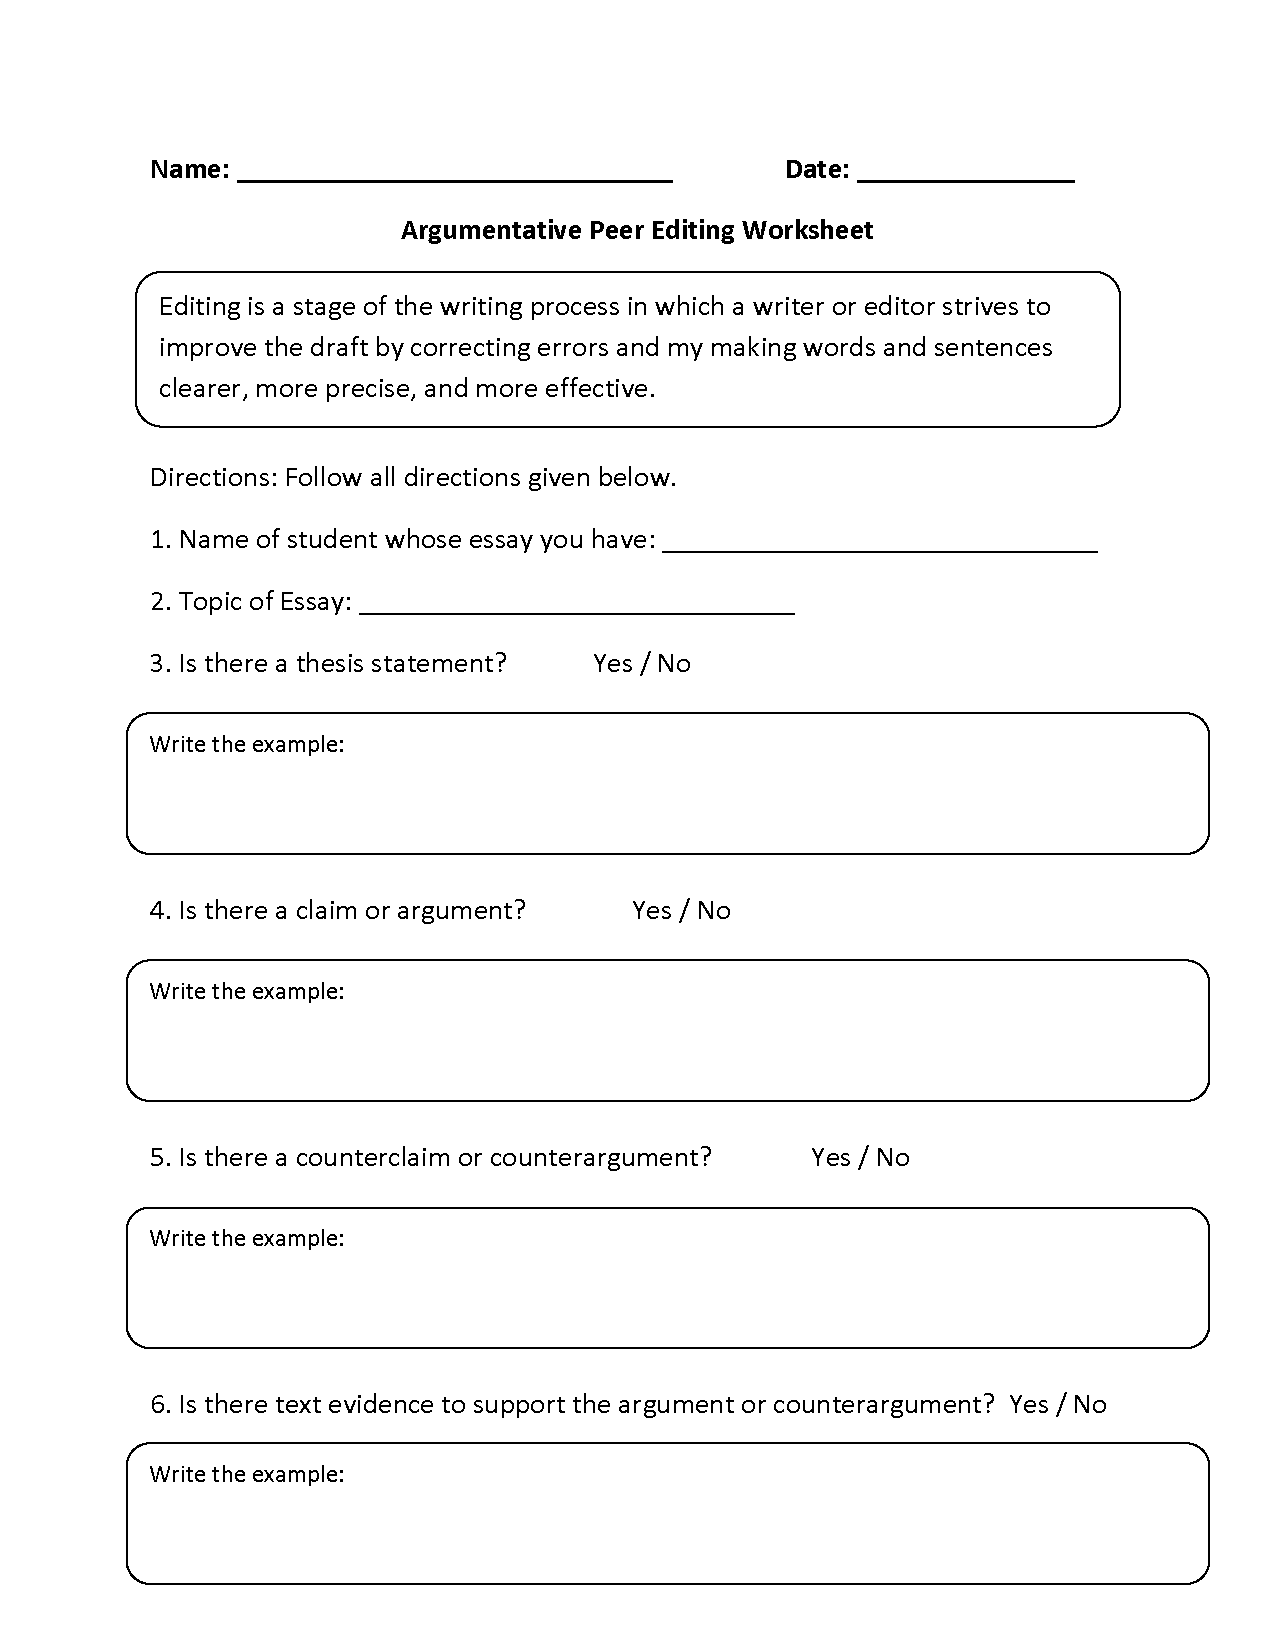 Argumentative Peer Editing Worksheets